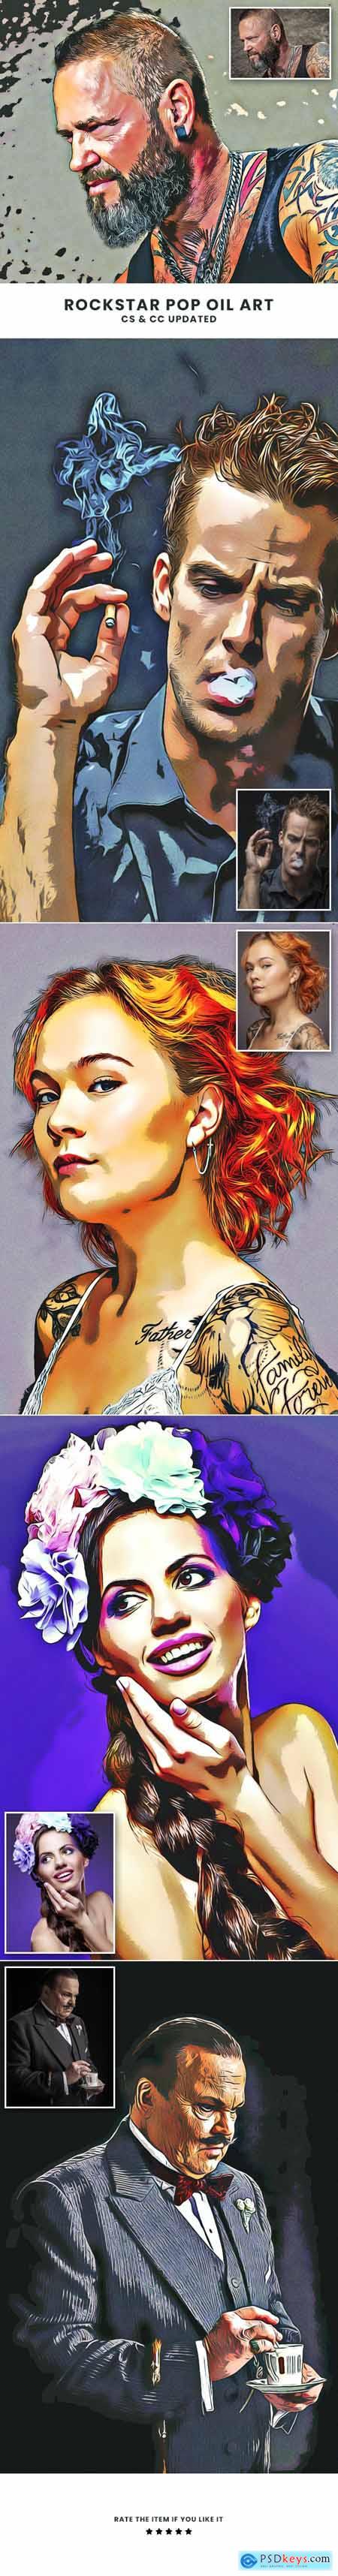 Rockstar Pop Oil Art 29374411